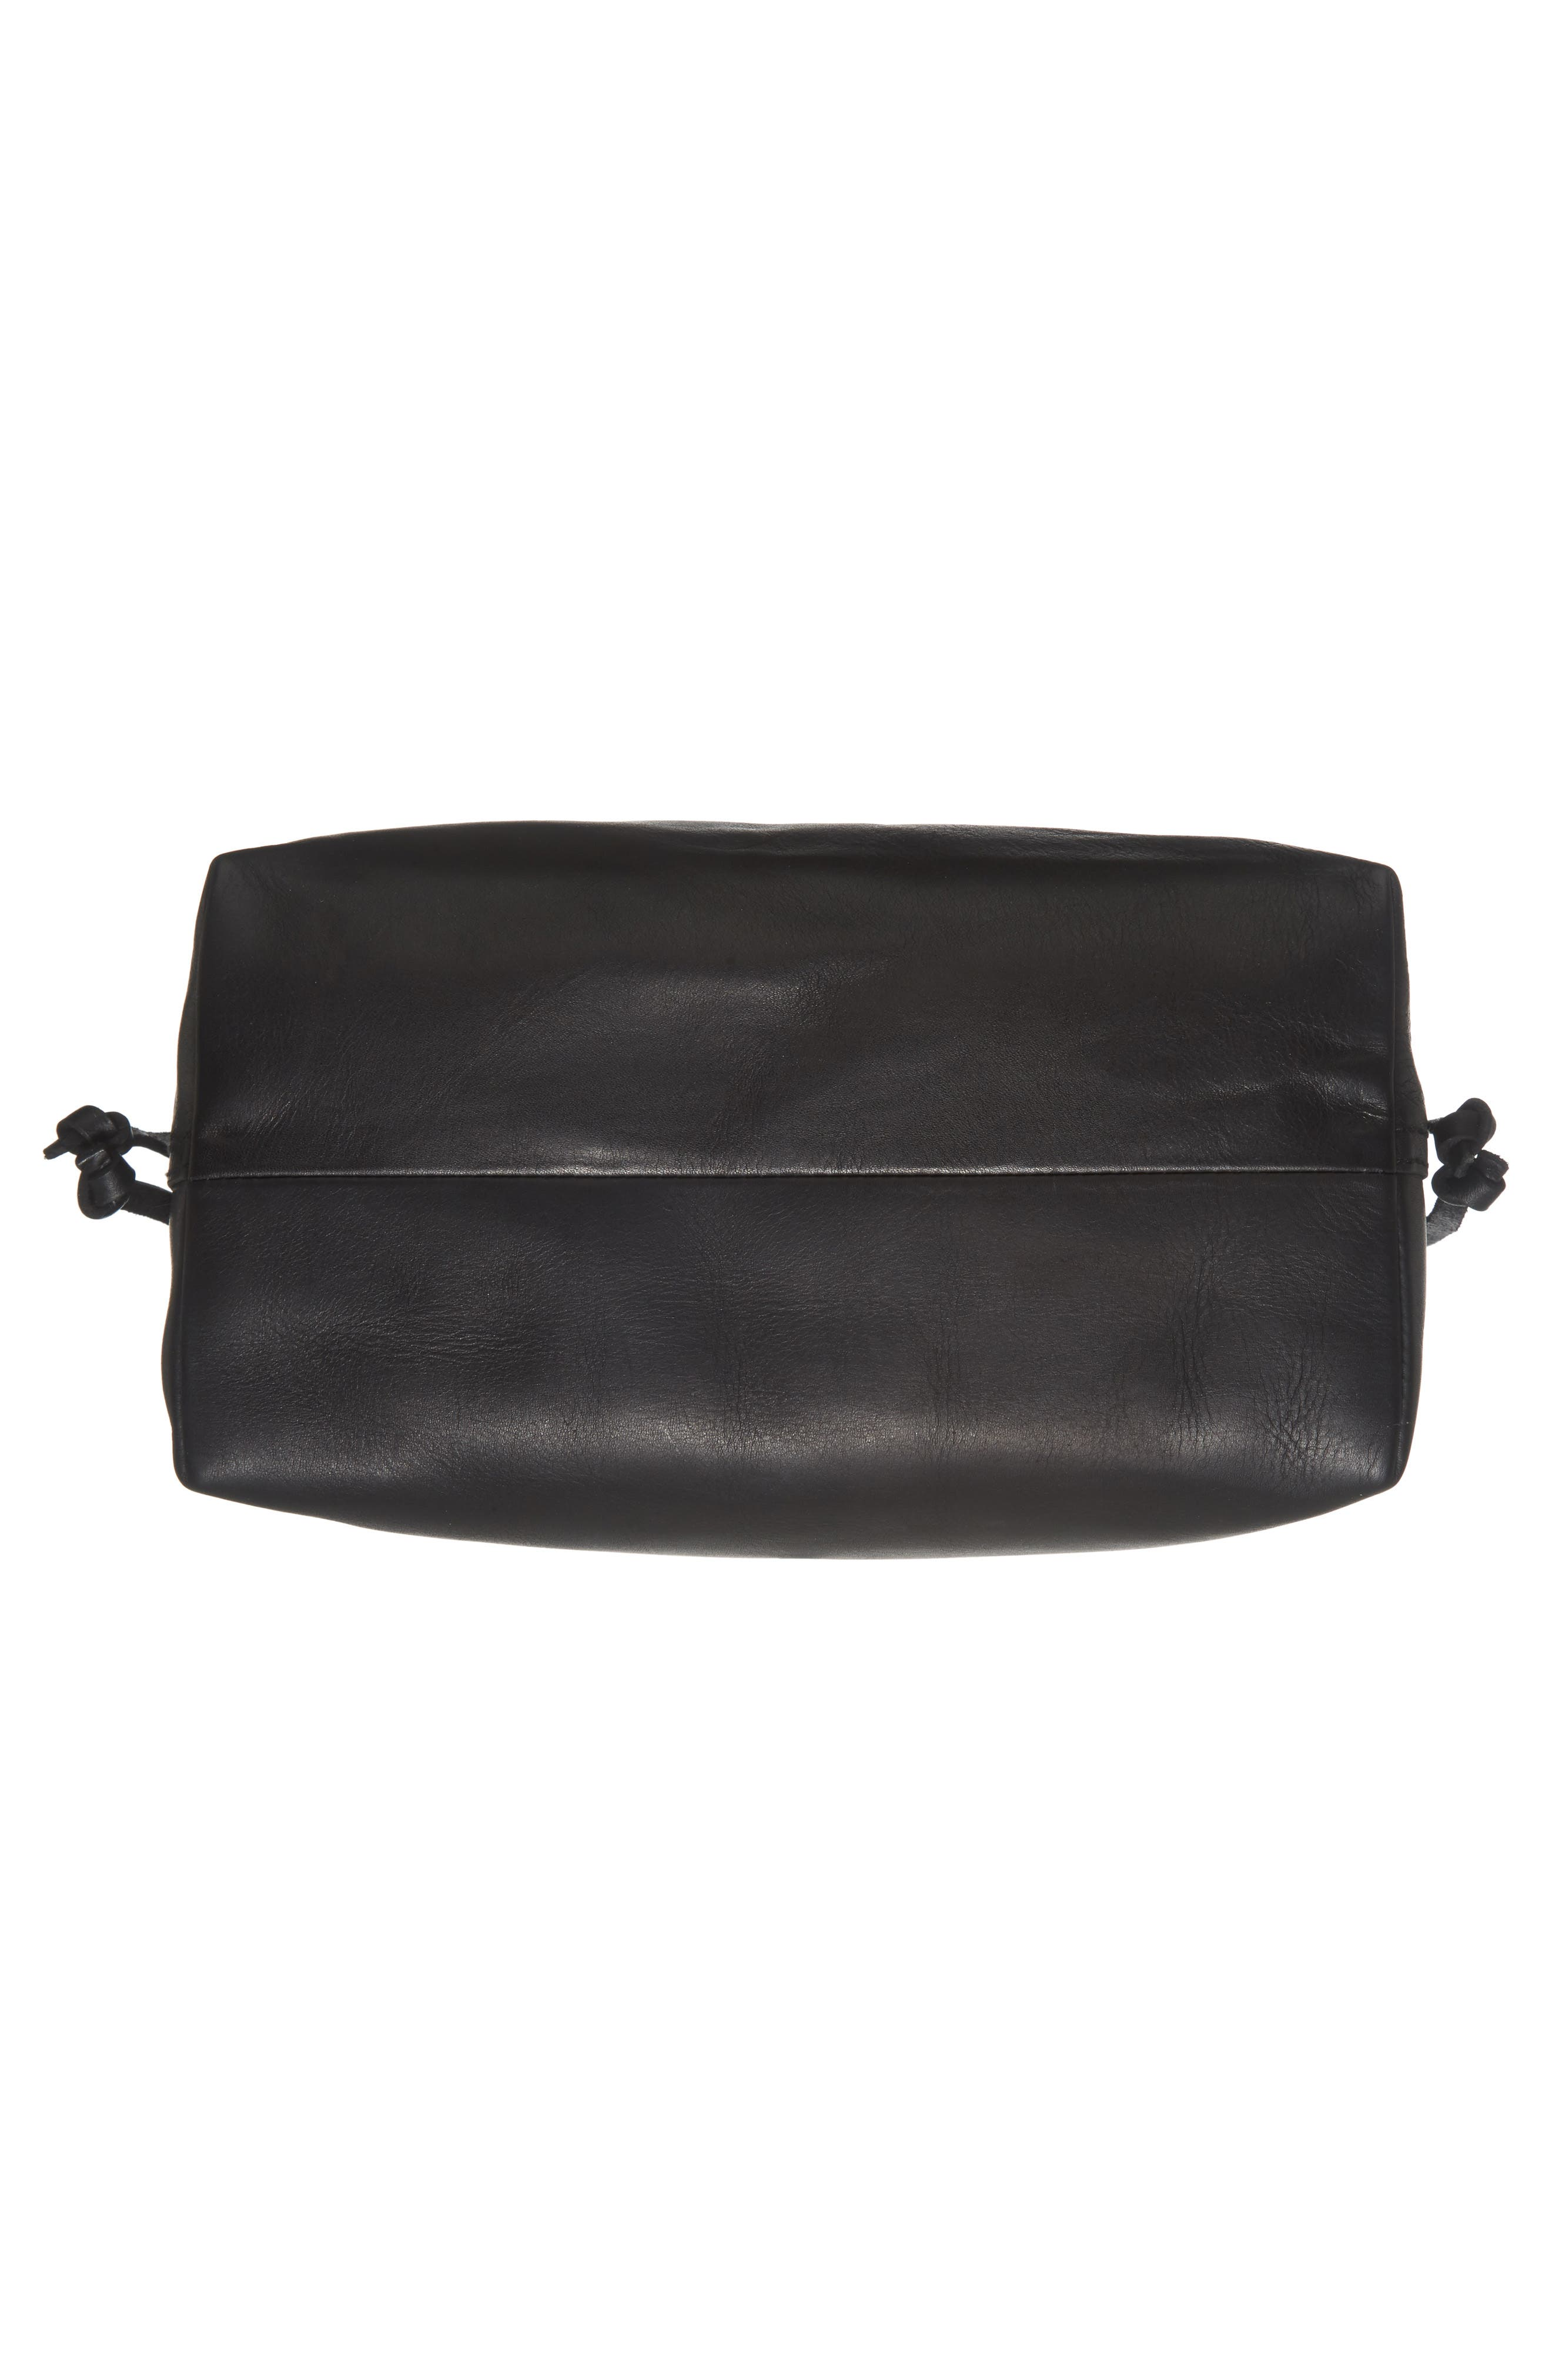 Medium Drawstring Transport Leather Tote,                             Alternate thumbnail 6, color,                             TRUE BLACK